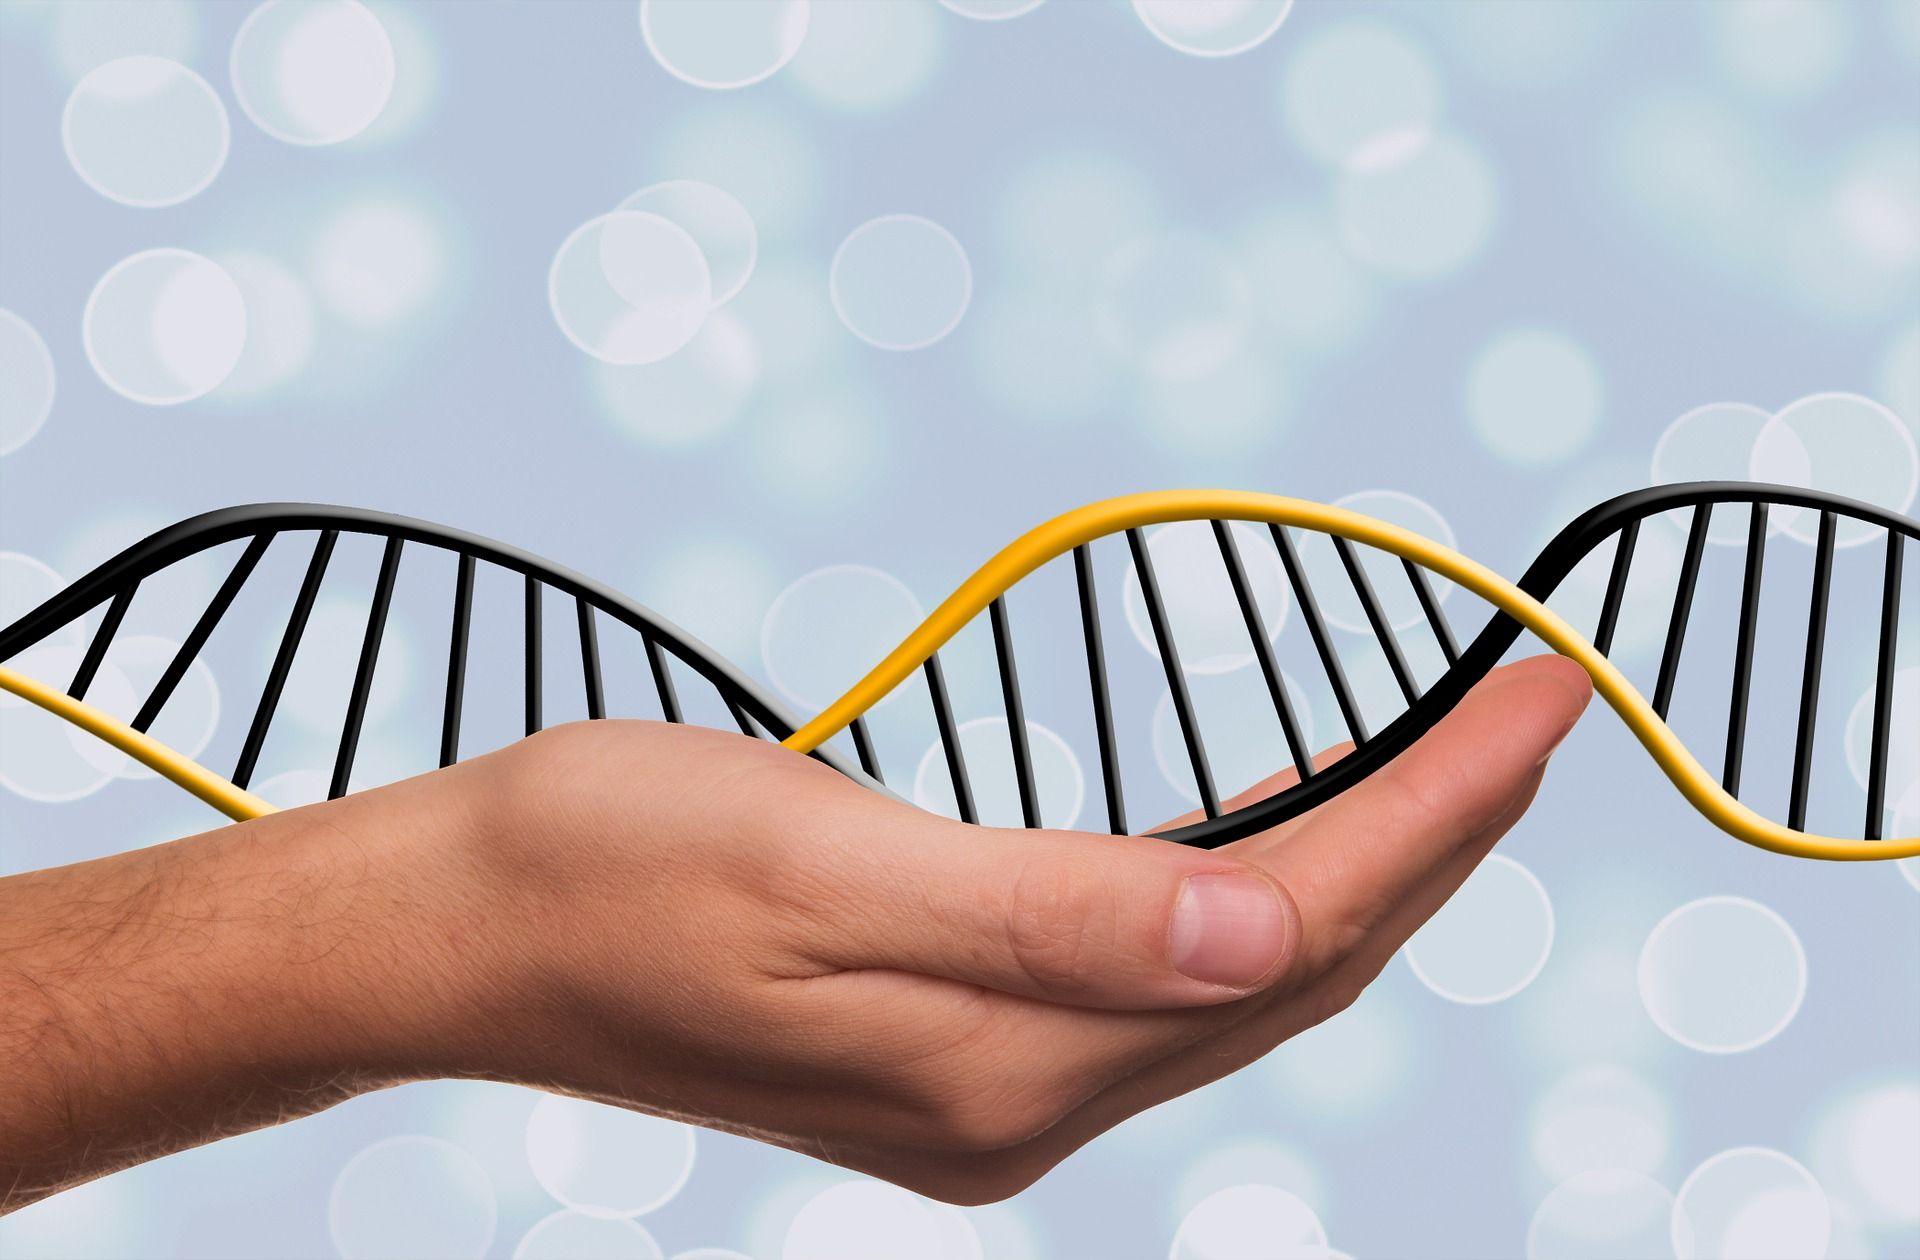 Puterea noii biologii